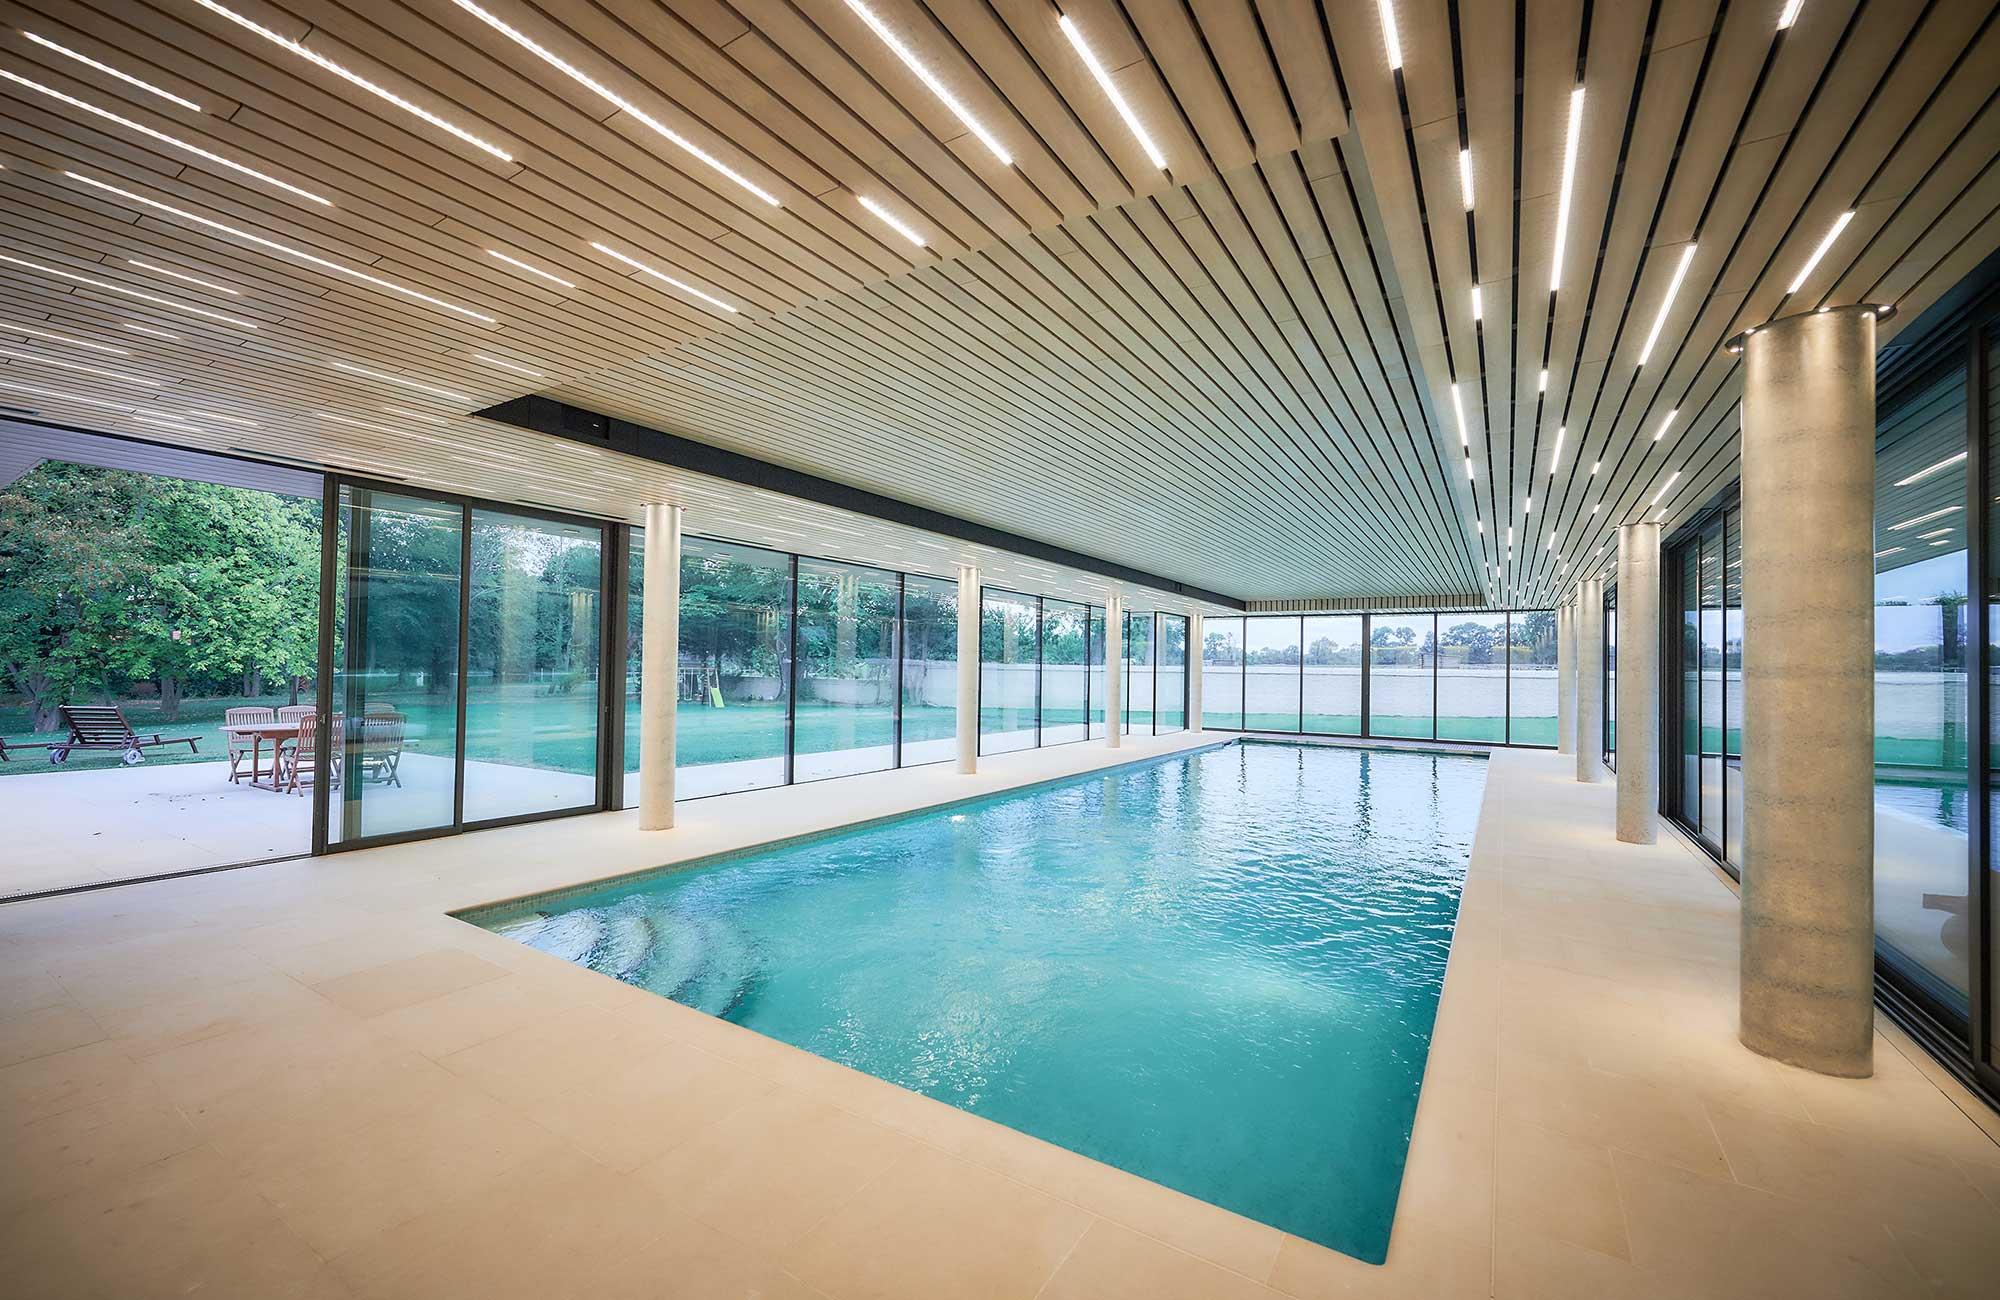 Caen piscine terrasse piscine molitor caen velux inoui for Piscine privee rennes